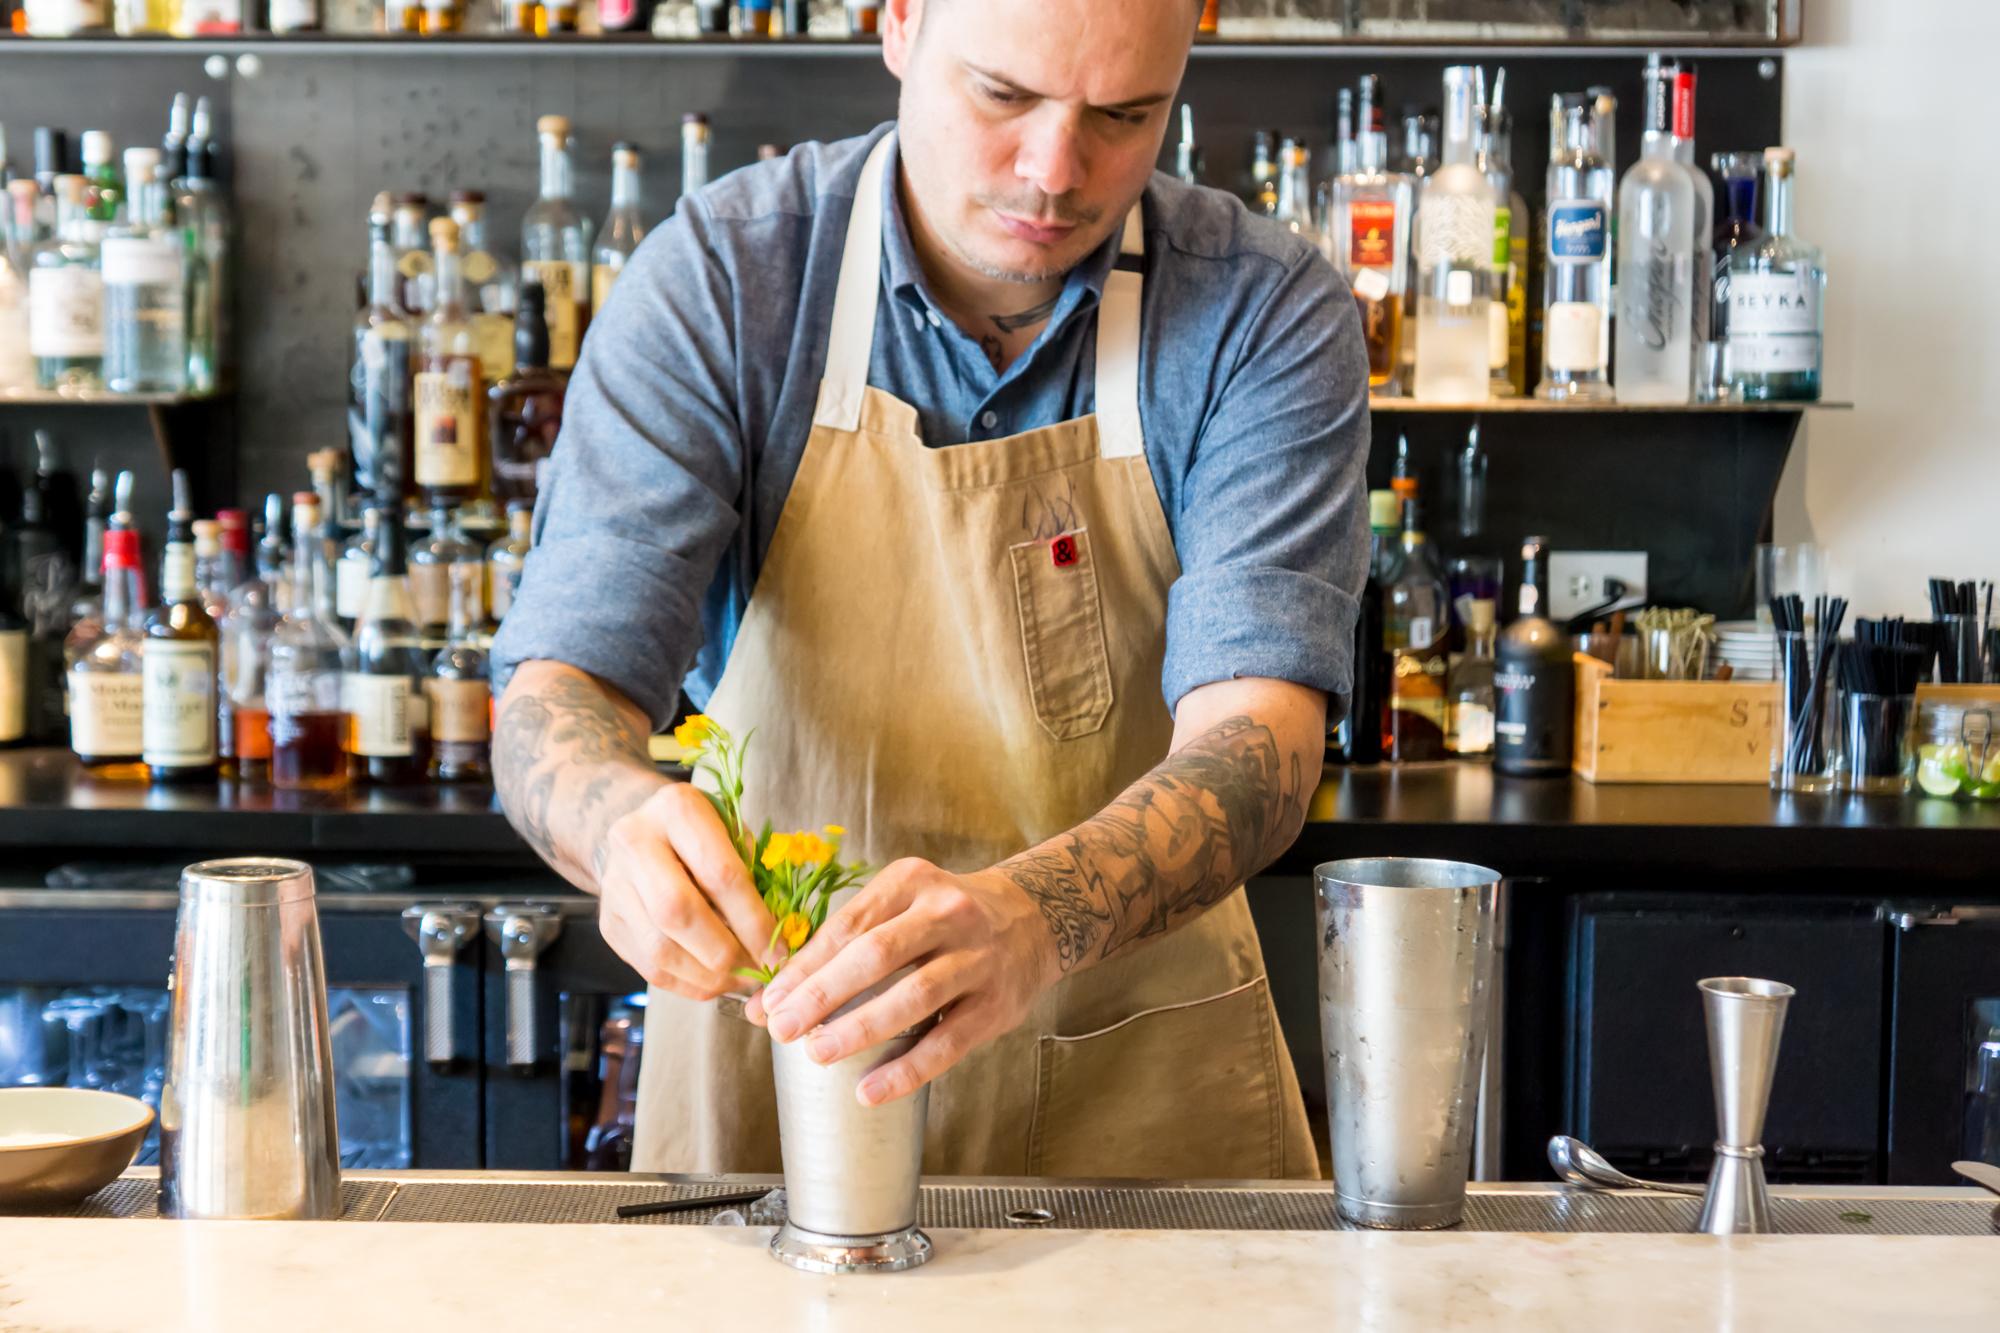 FT33 barman Tristan Price makes a Marigold Mint Julep.